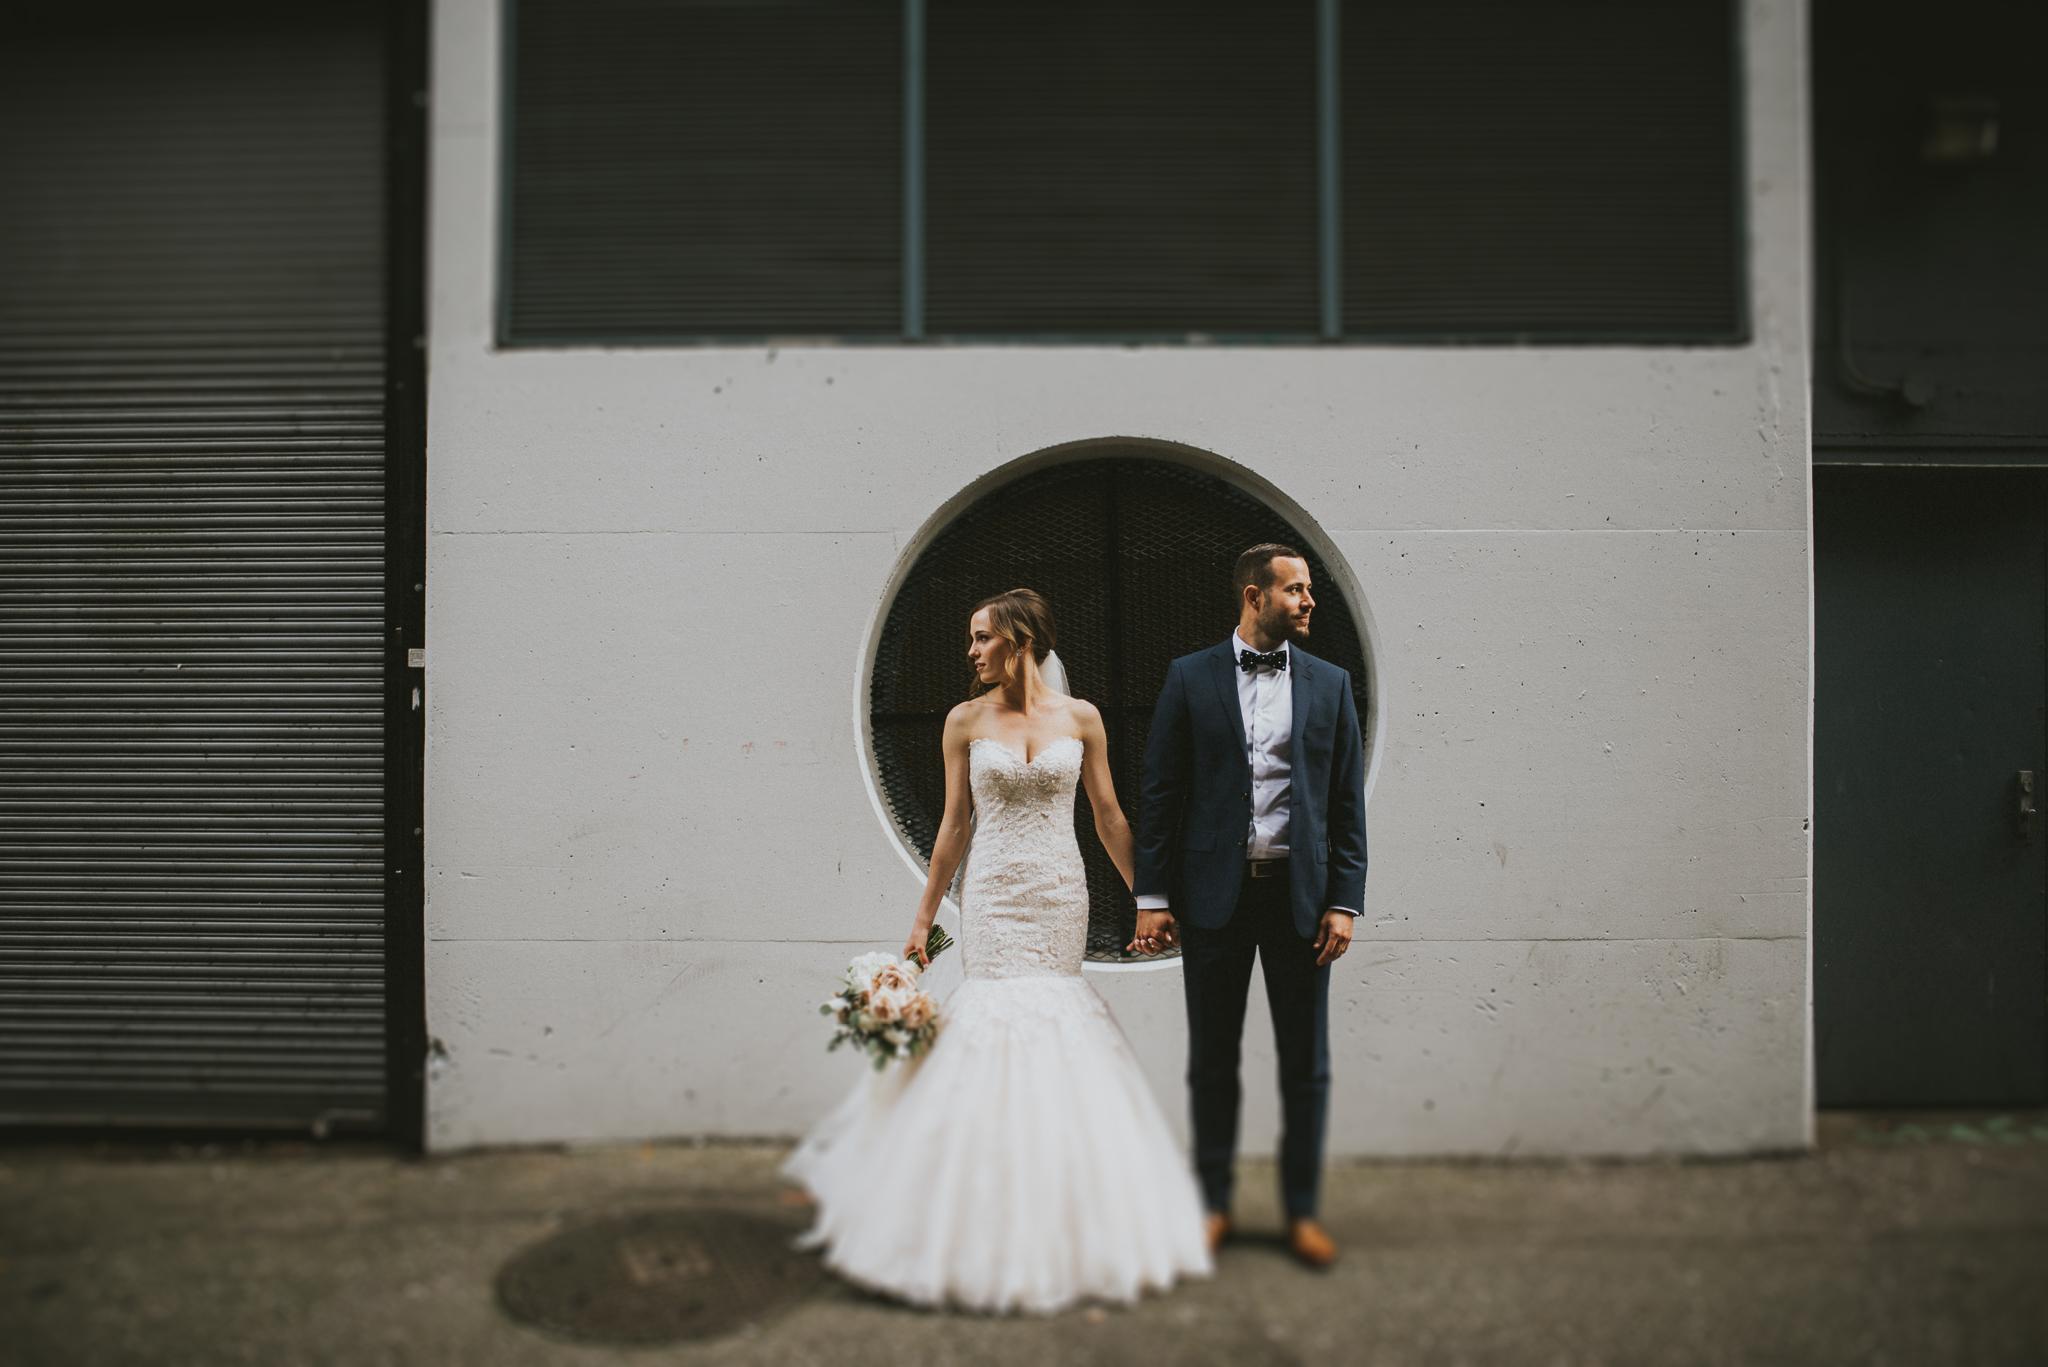 131-permanent-vancouver-wedding-courtneysteven-web-8527-ts.jpg